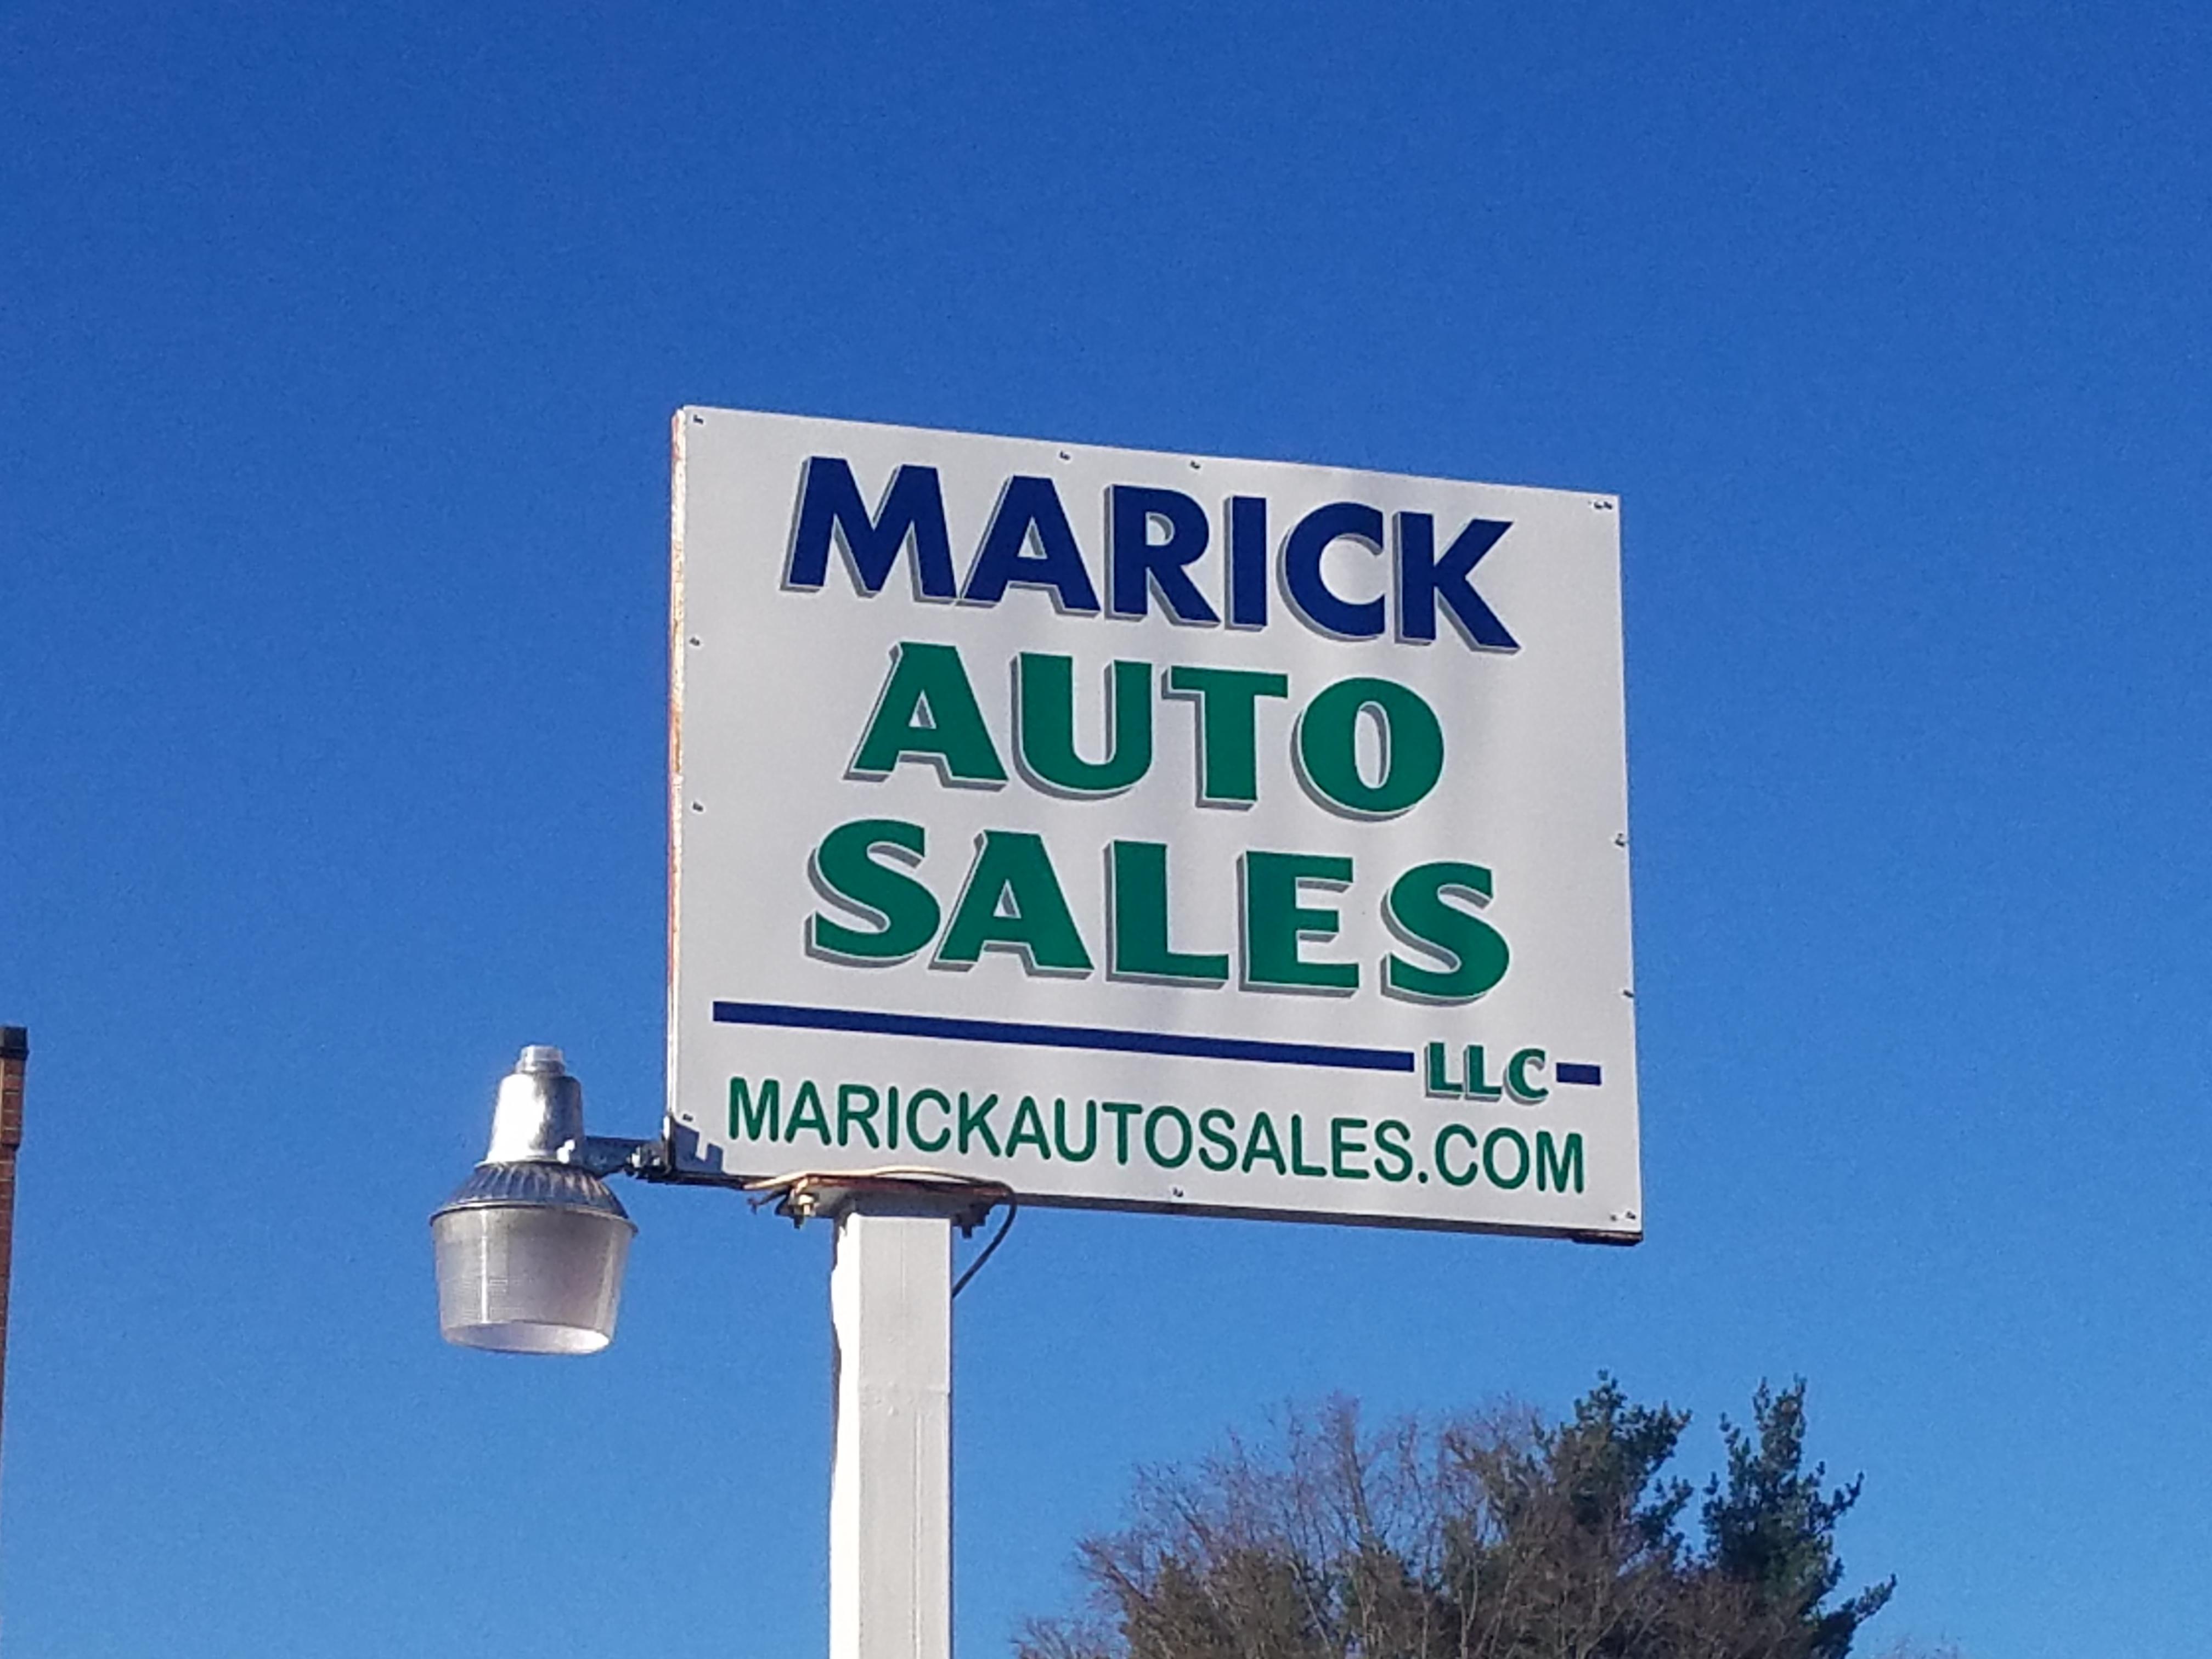 Marick Auto Sales LLC image 1